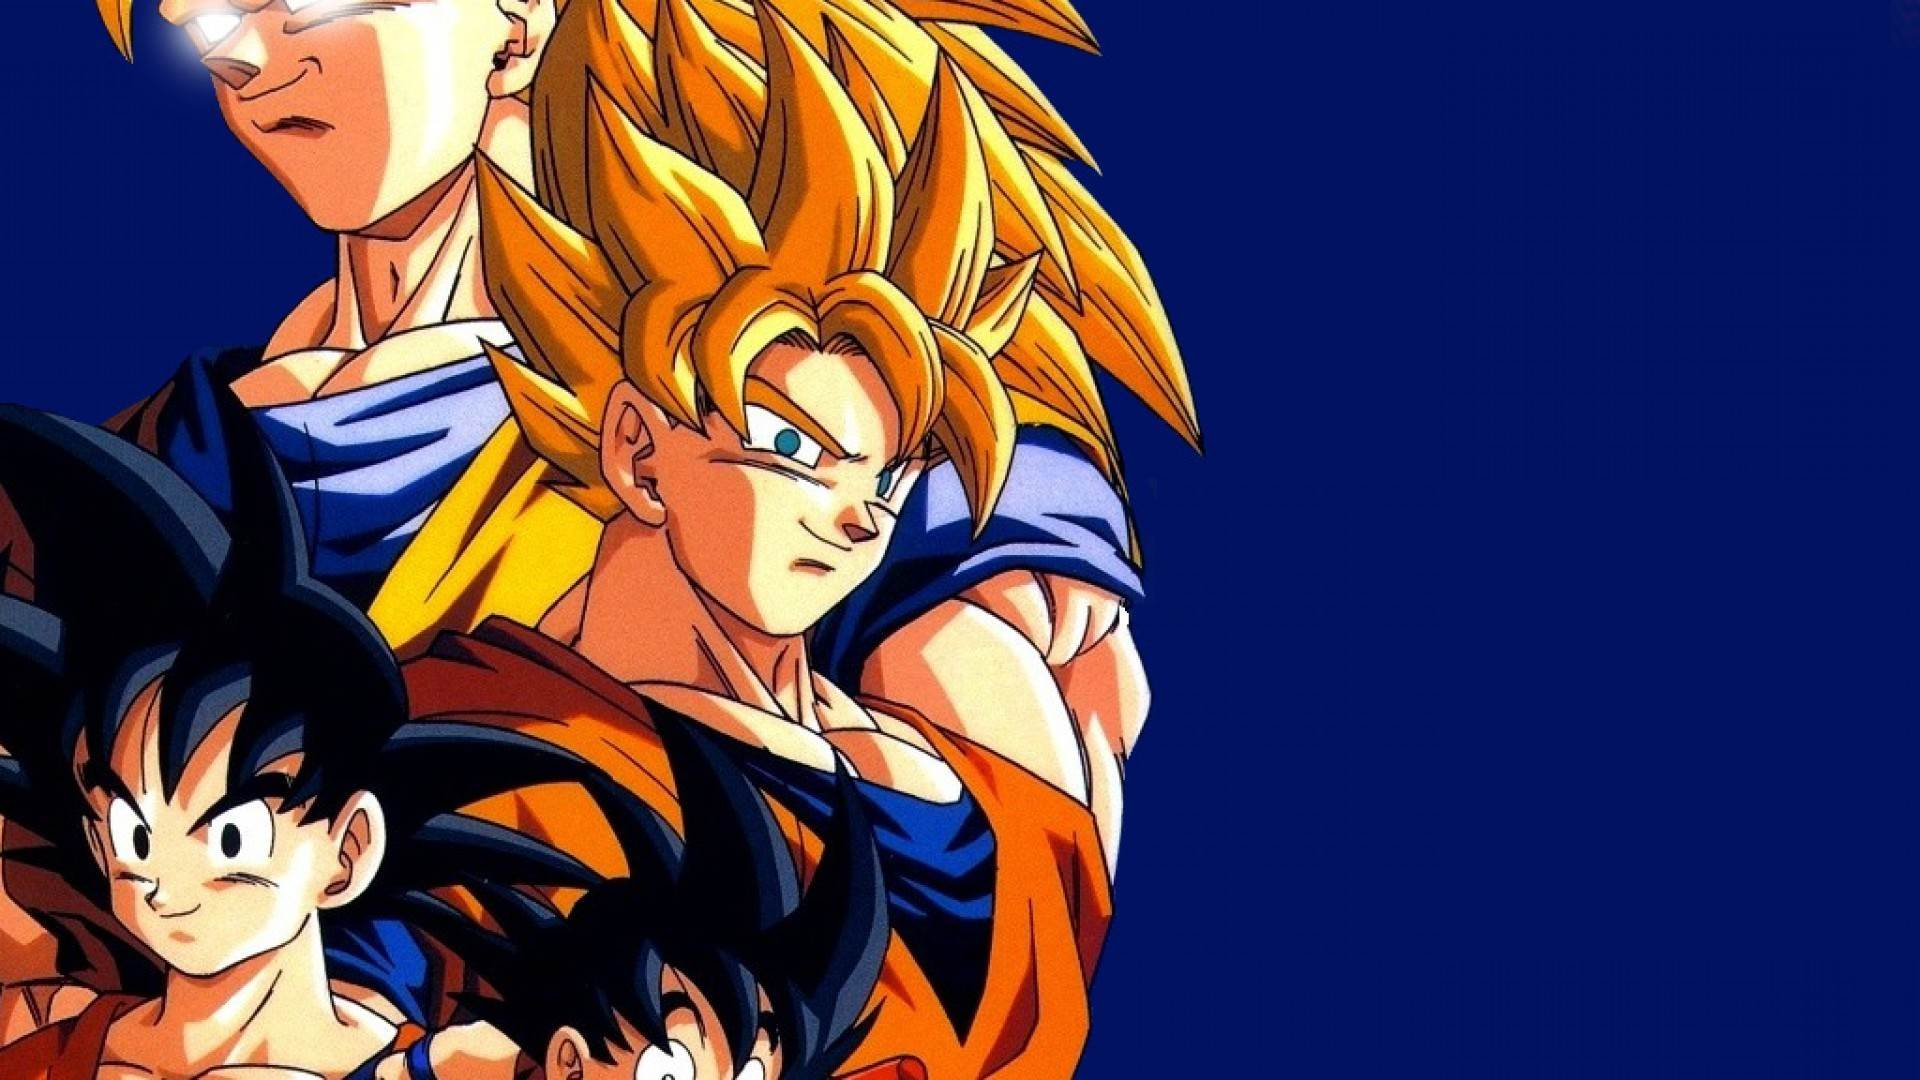 Super Saiyan Goku Wallpaper Hd Hdwallpapernet 1920x1080